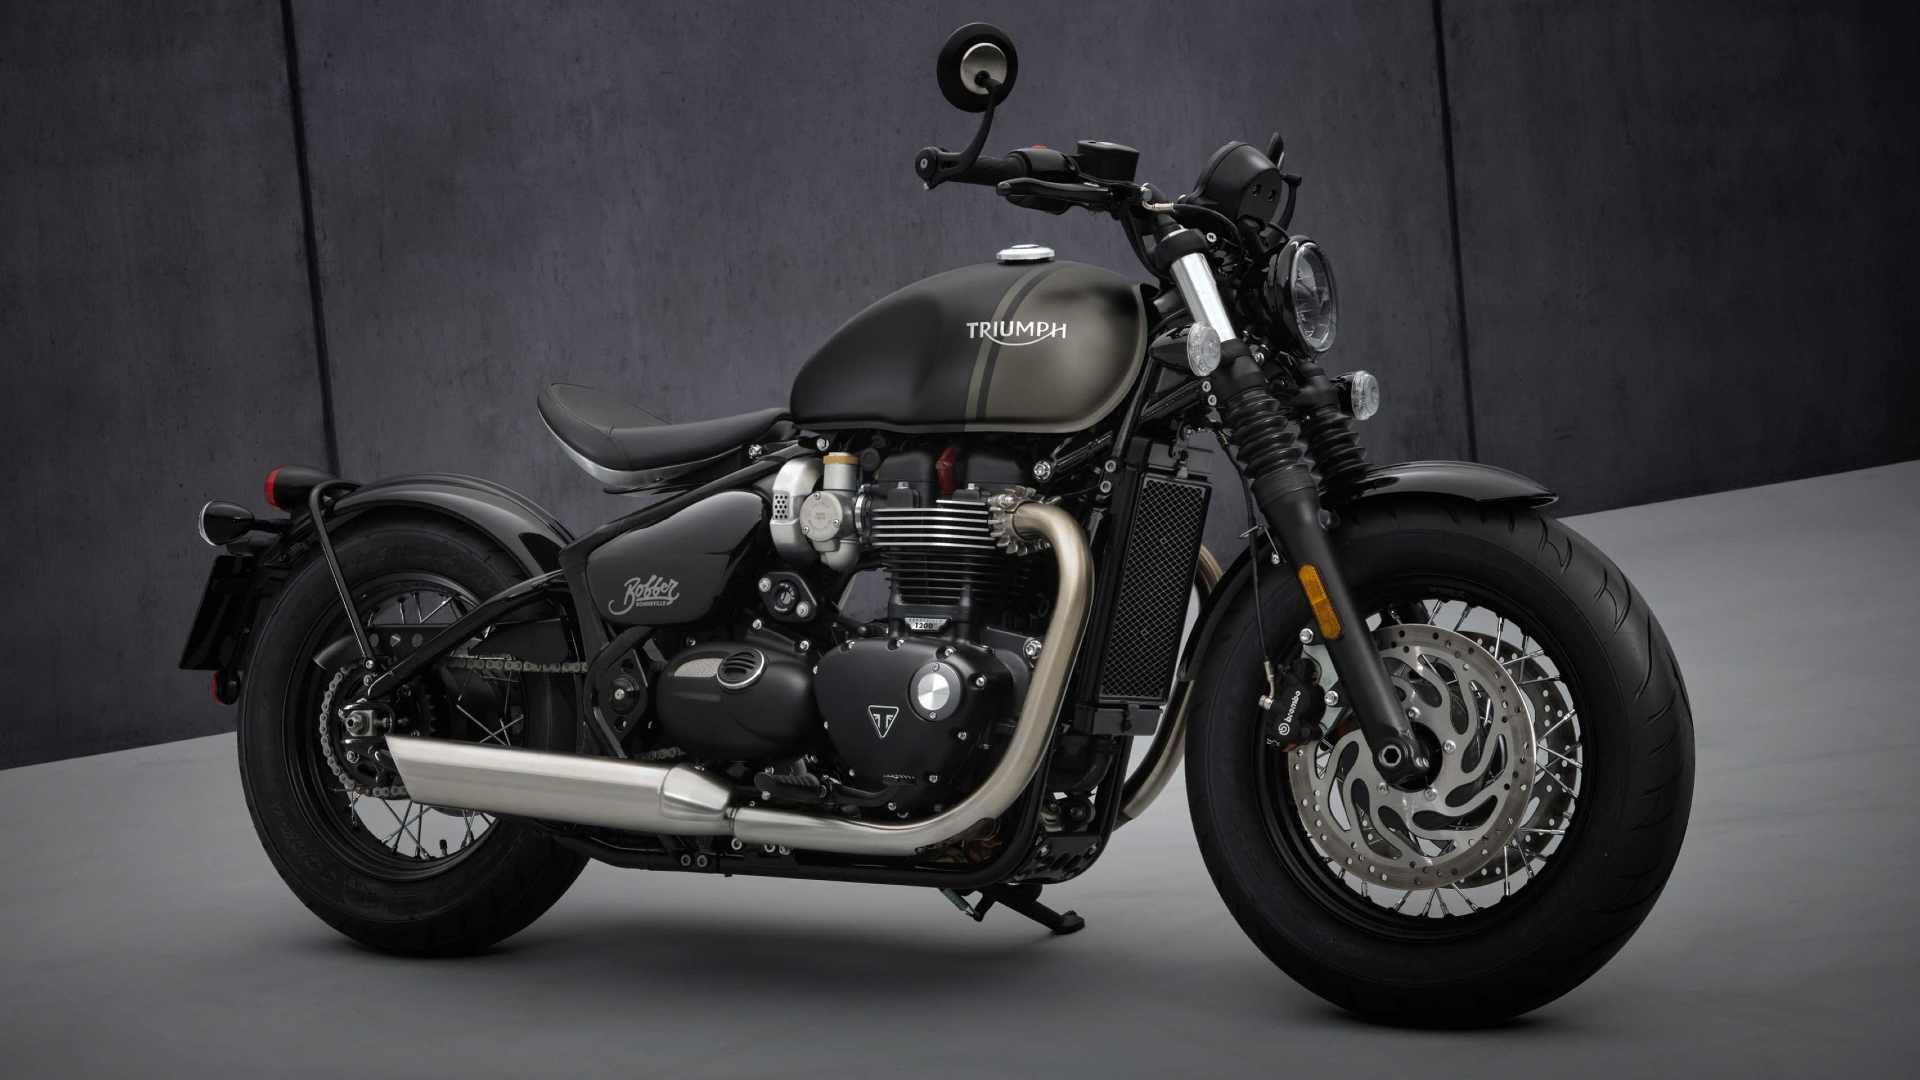 A highlight of the 2021 Triumph Bonneville Bobber is its larger, 12-litre fuel tank. Image: Triumph Motorcycles